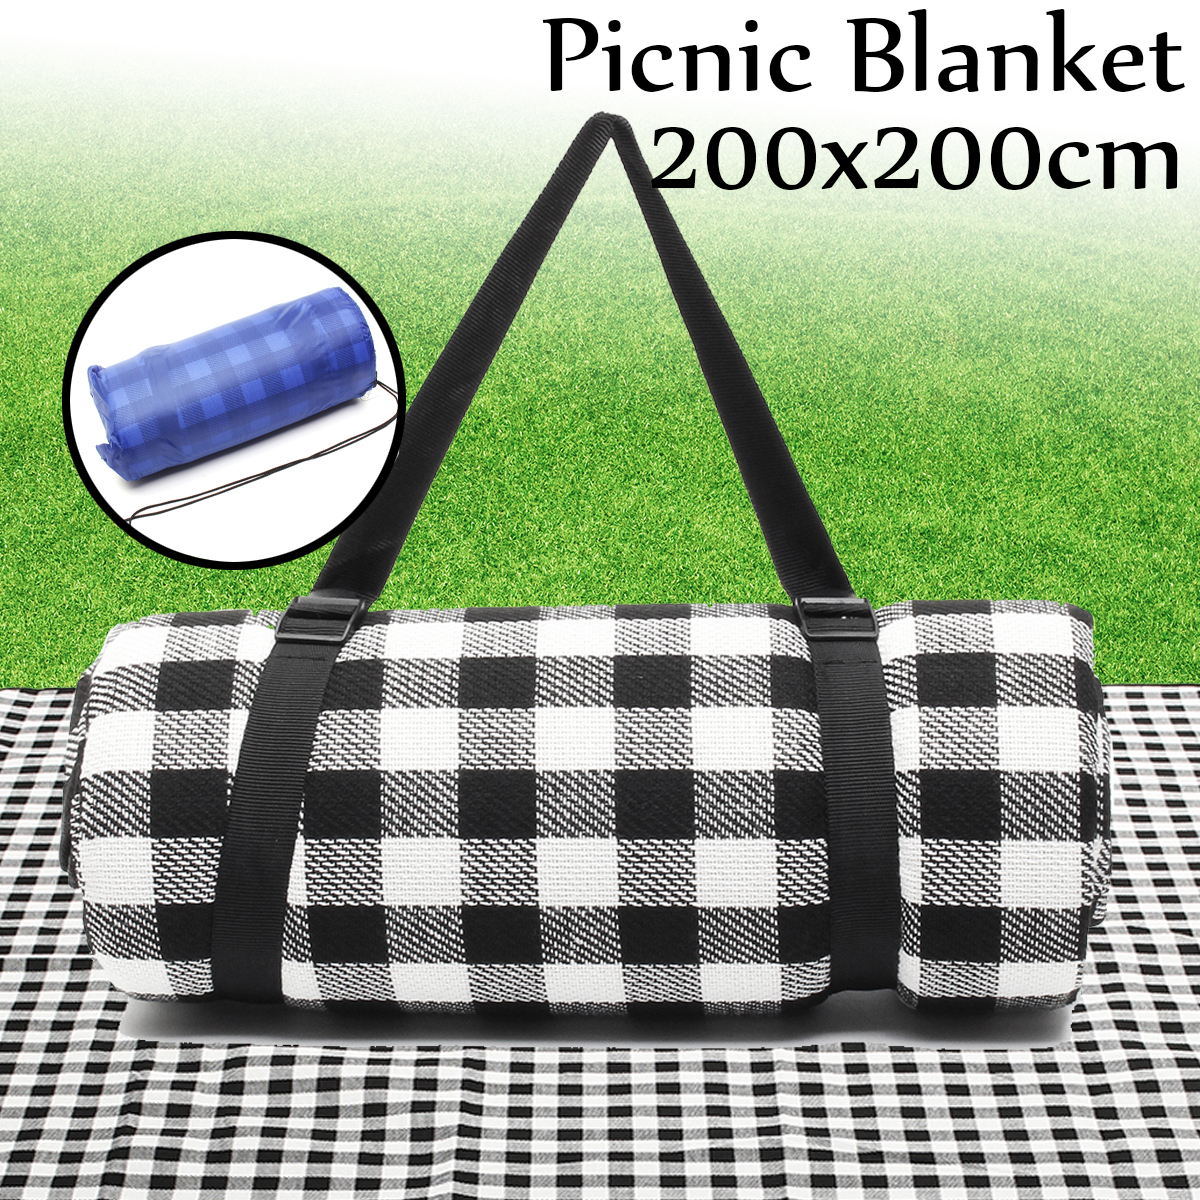 200X200cm Large Picnic Blanket Waterproof Rug Mat Baby Mat Foldable Outdoor Portable Camping Beach Mattress Black pastoral coral velvet large area rug